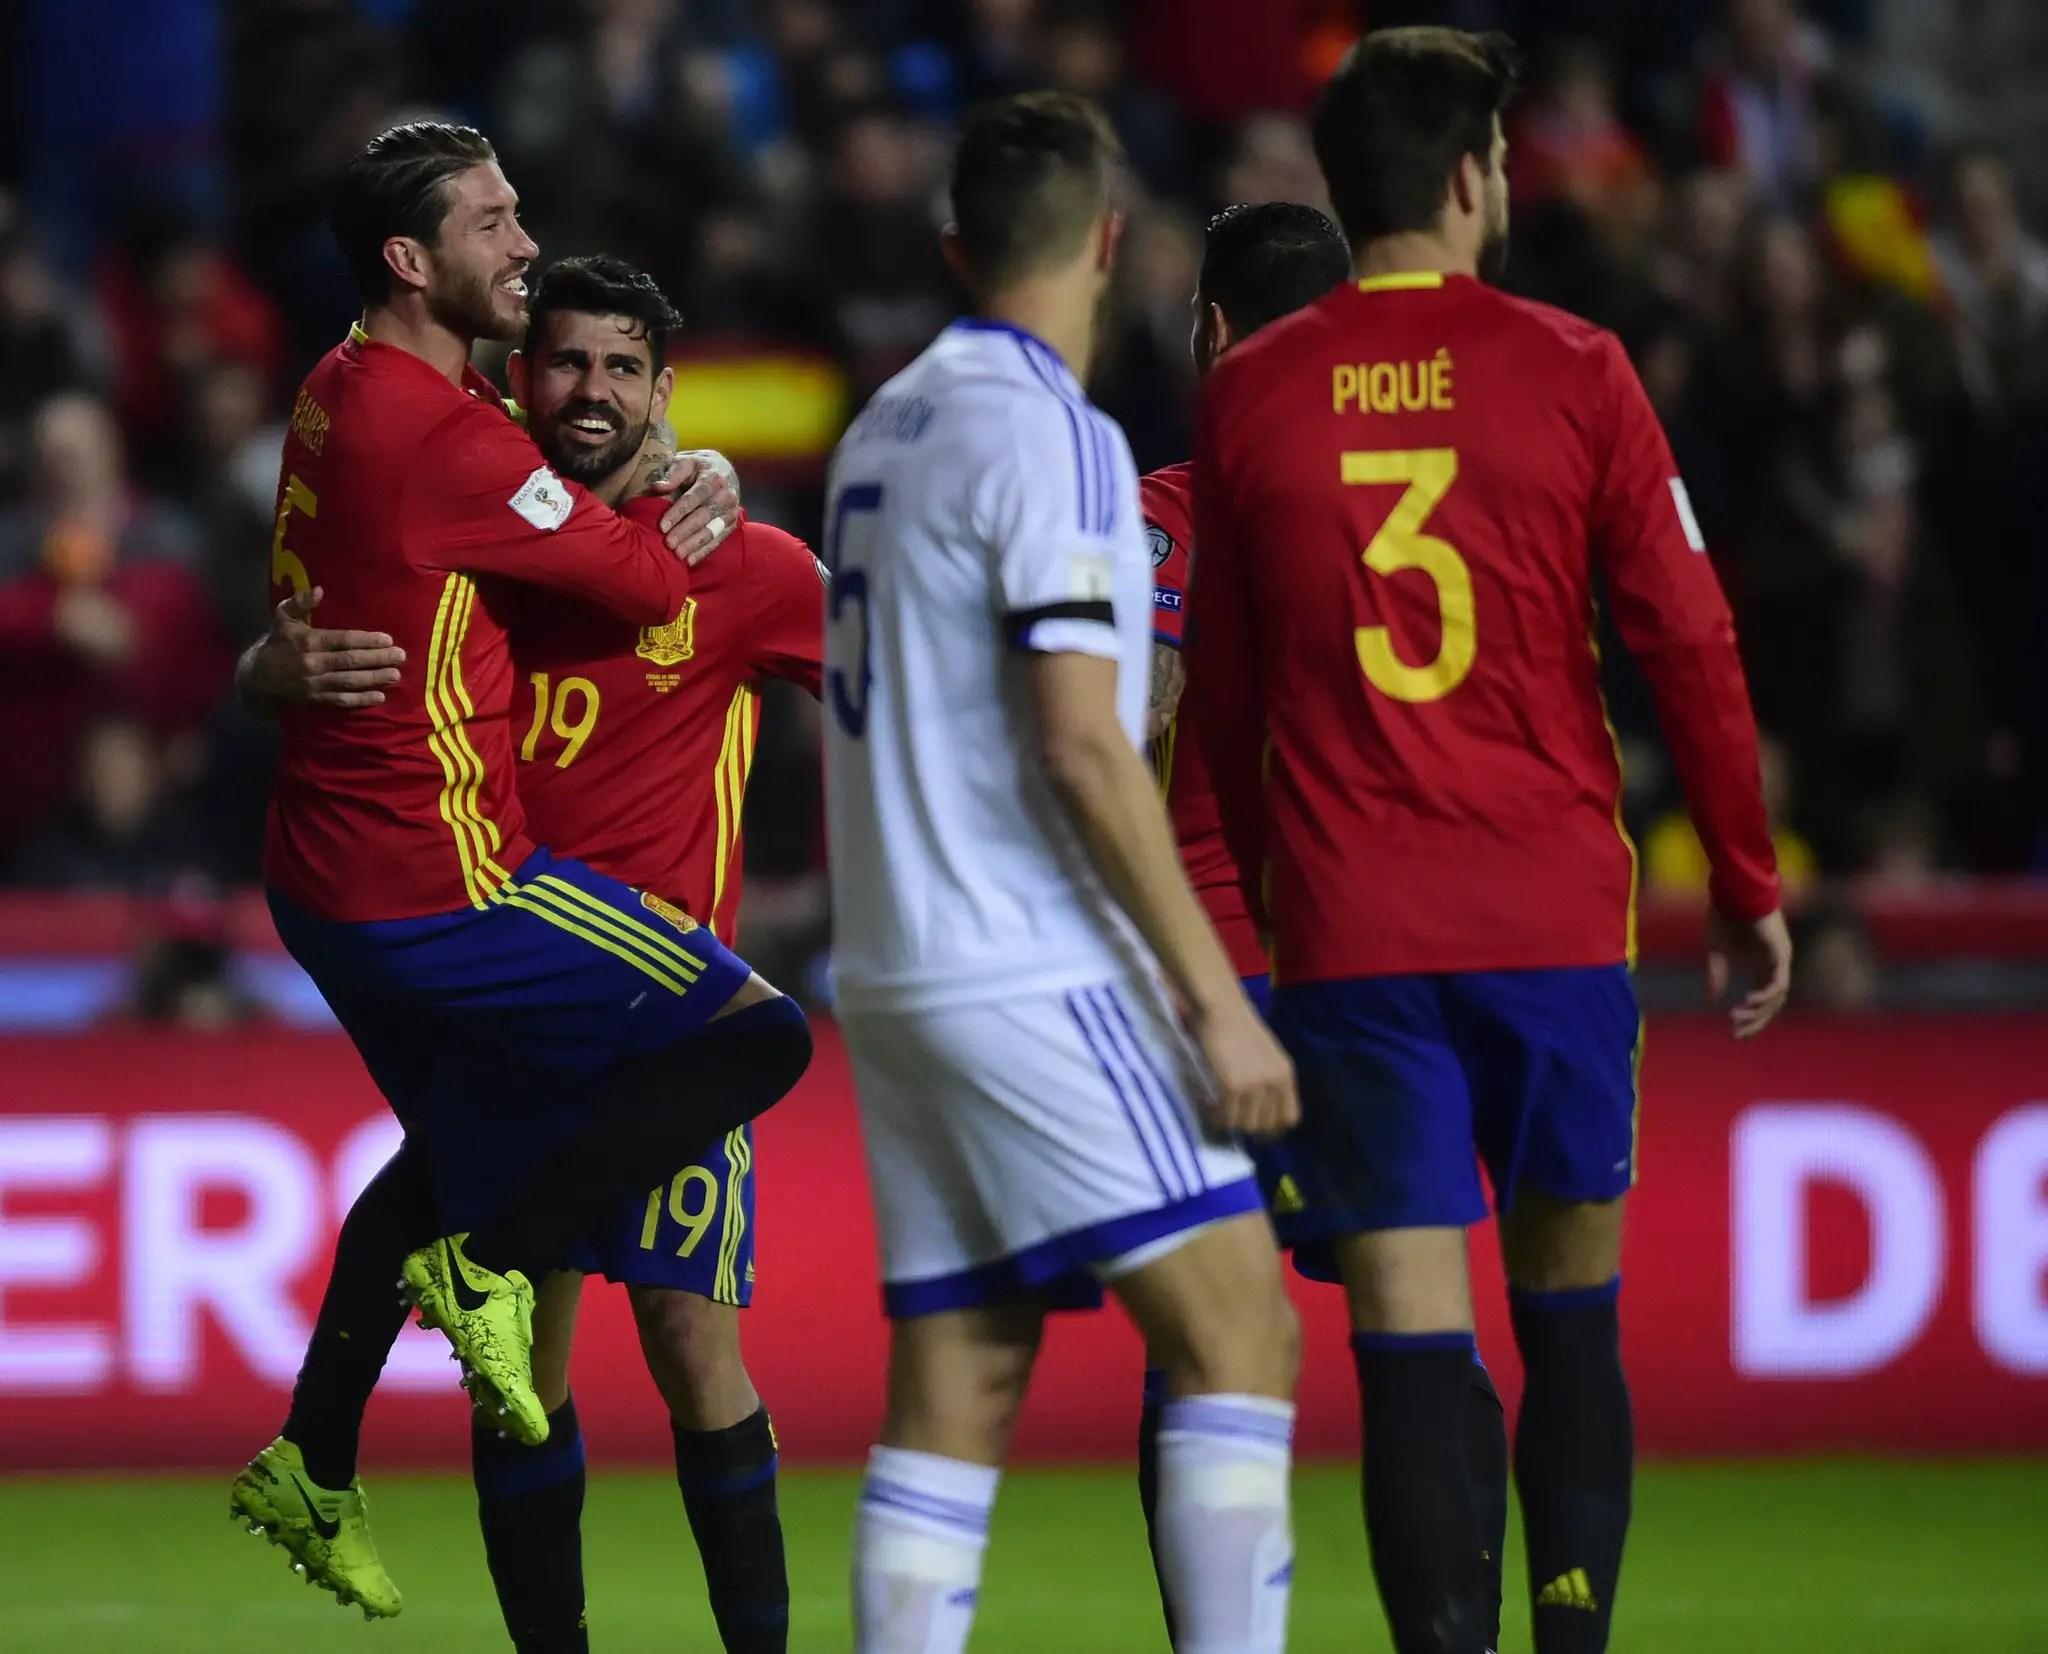 Russia 2018 WCQ: Spain, Italy, Turkey Win; Wales, Ireland Draw